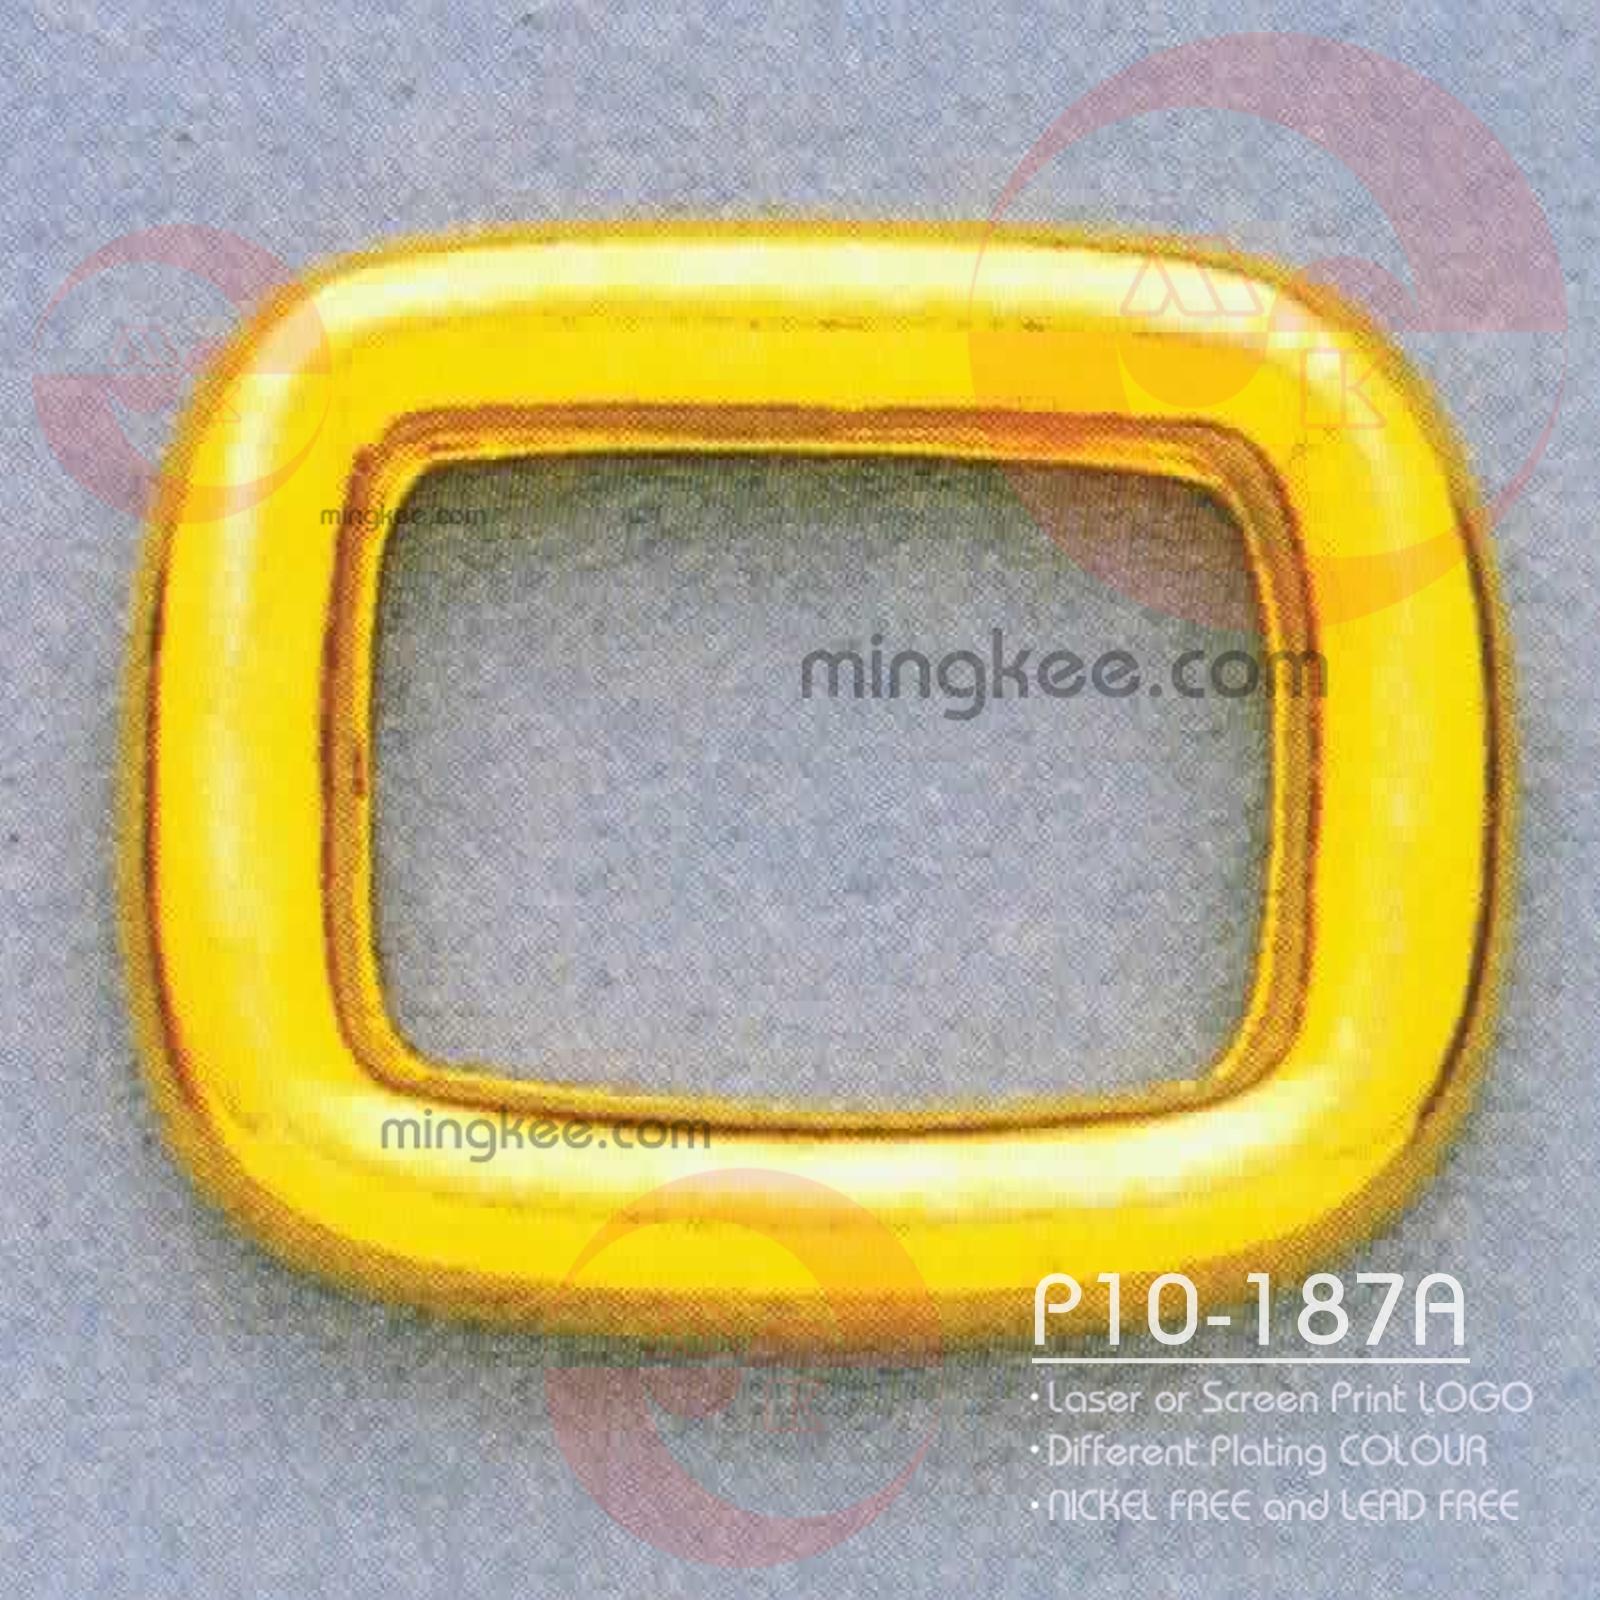 P10-187A